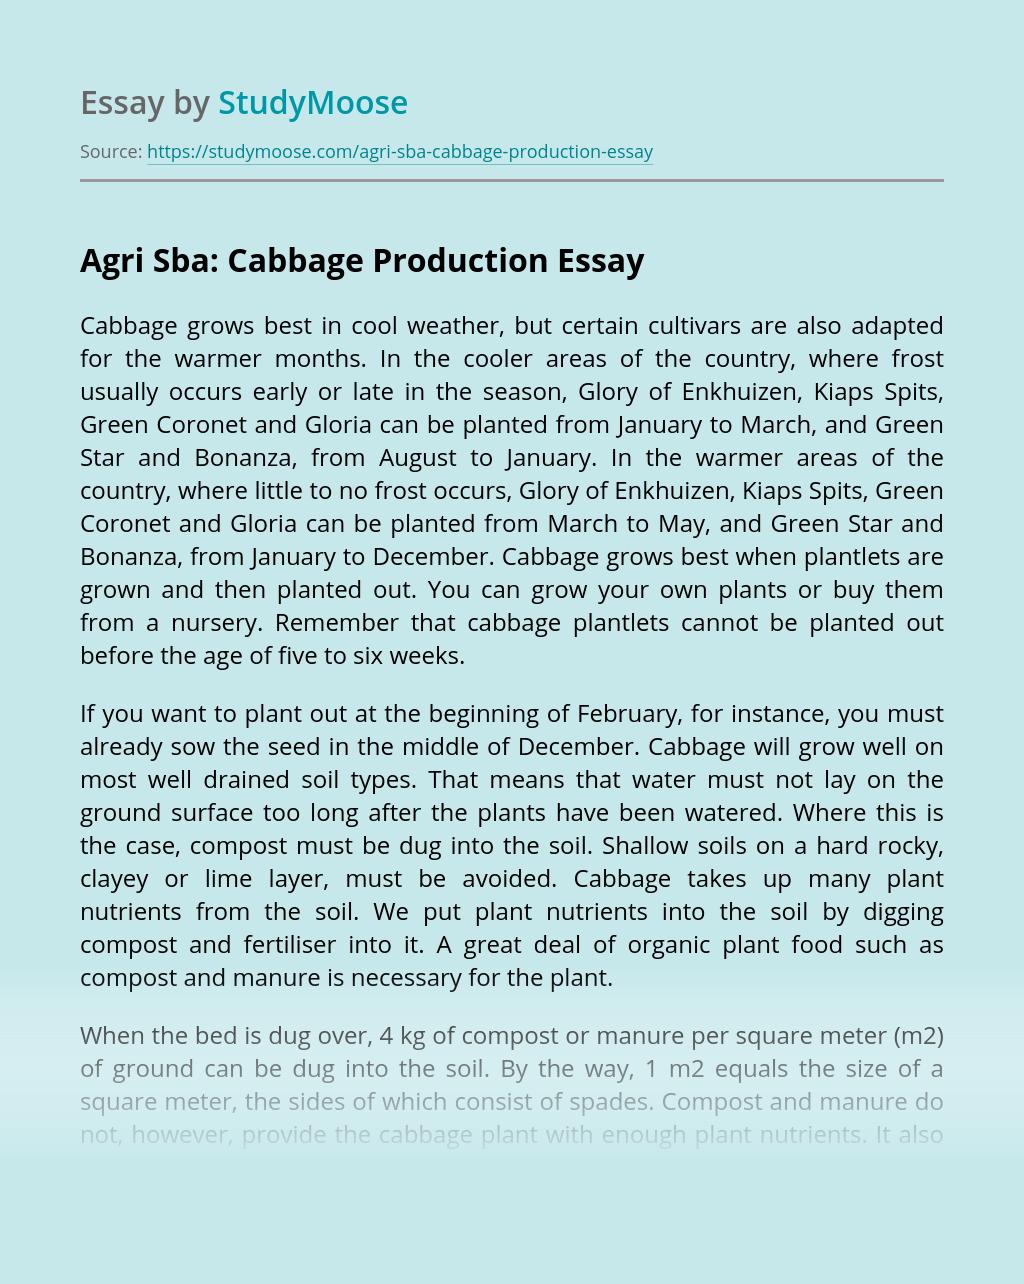 Agri Sba: Cabbage Production